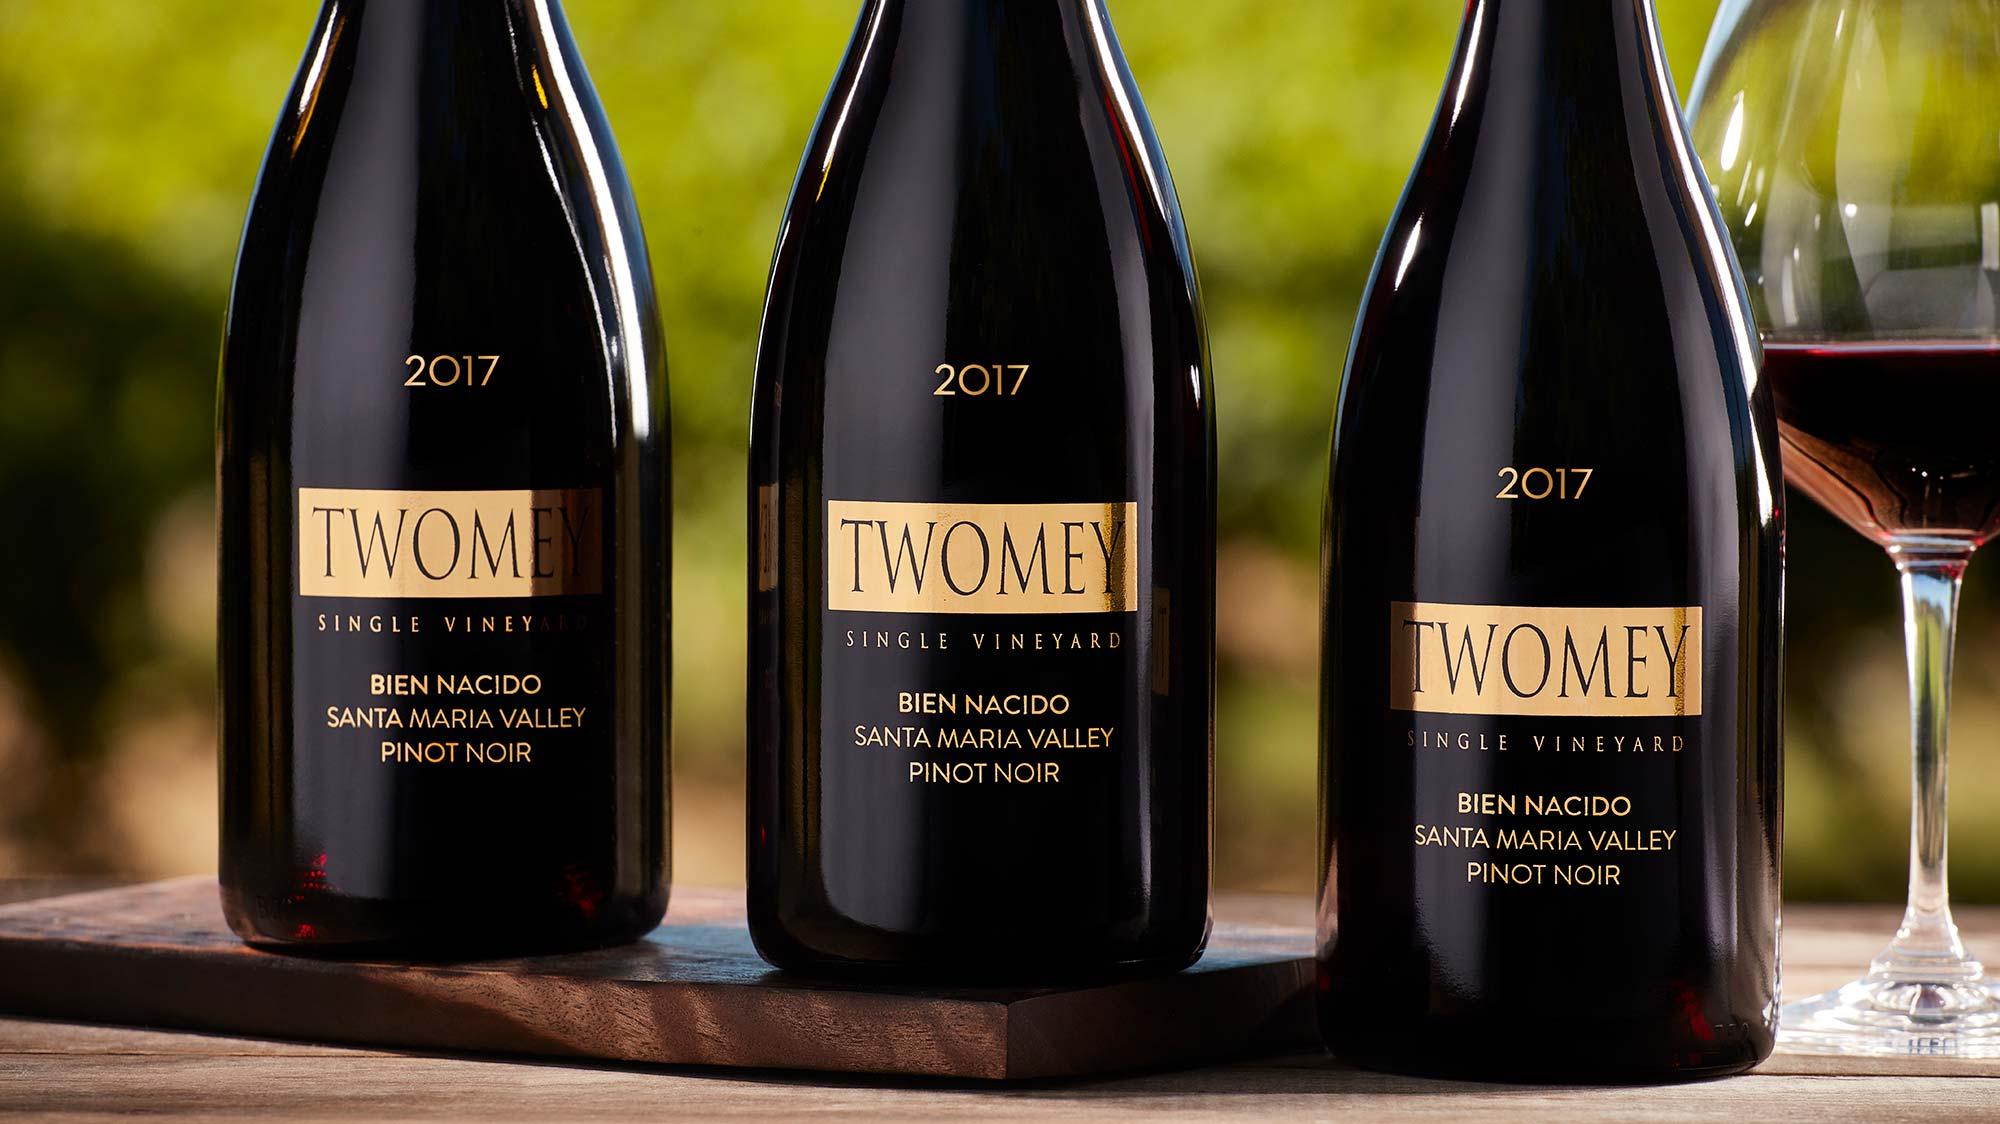 2017 Twomey Bien Nacido Pinot Noir